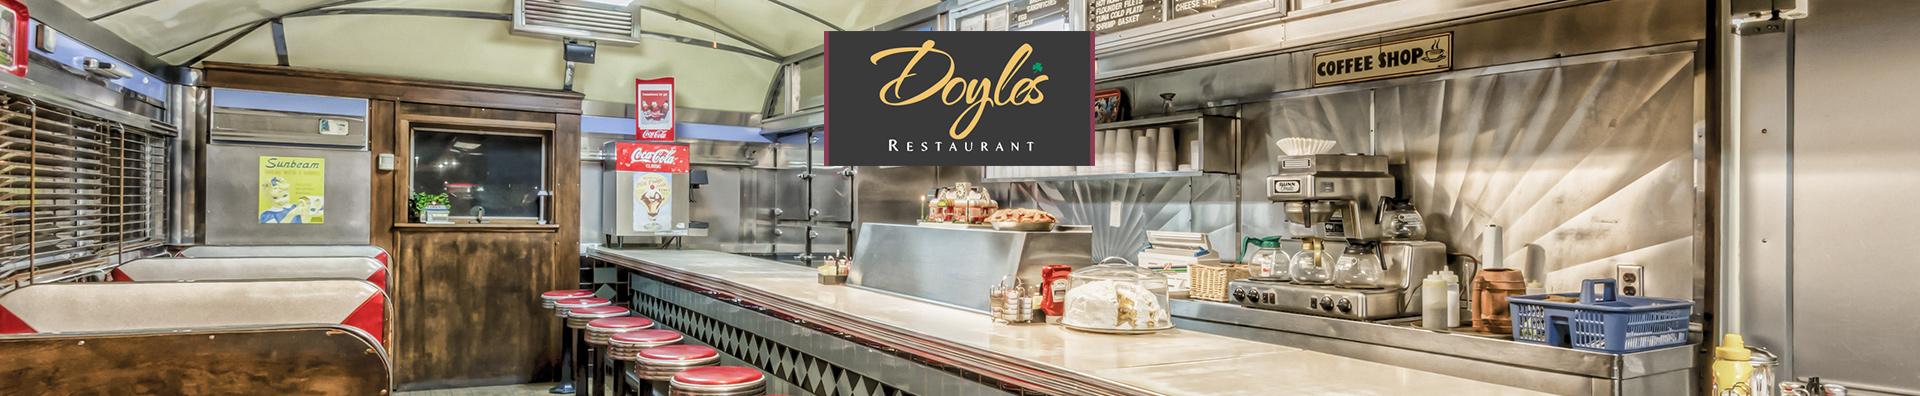 Doyle's Diner